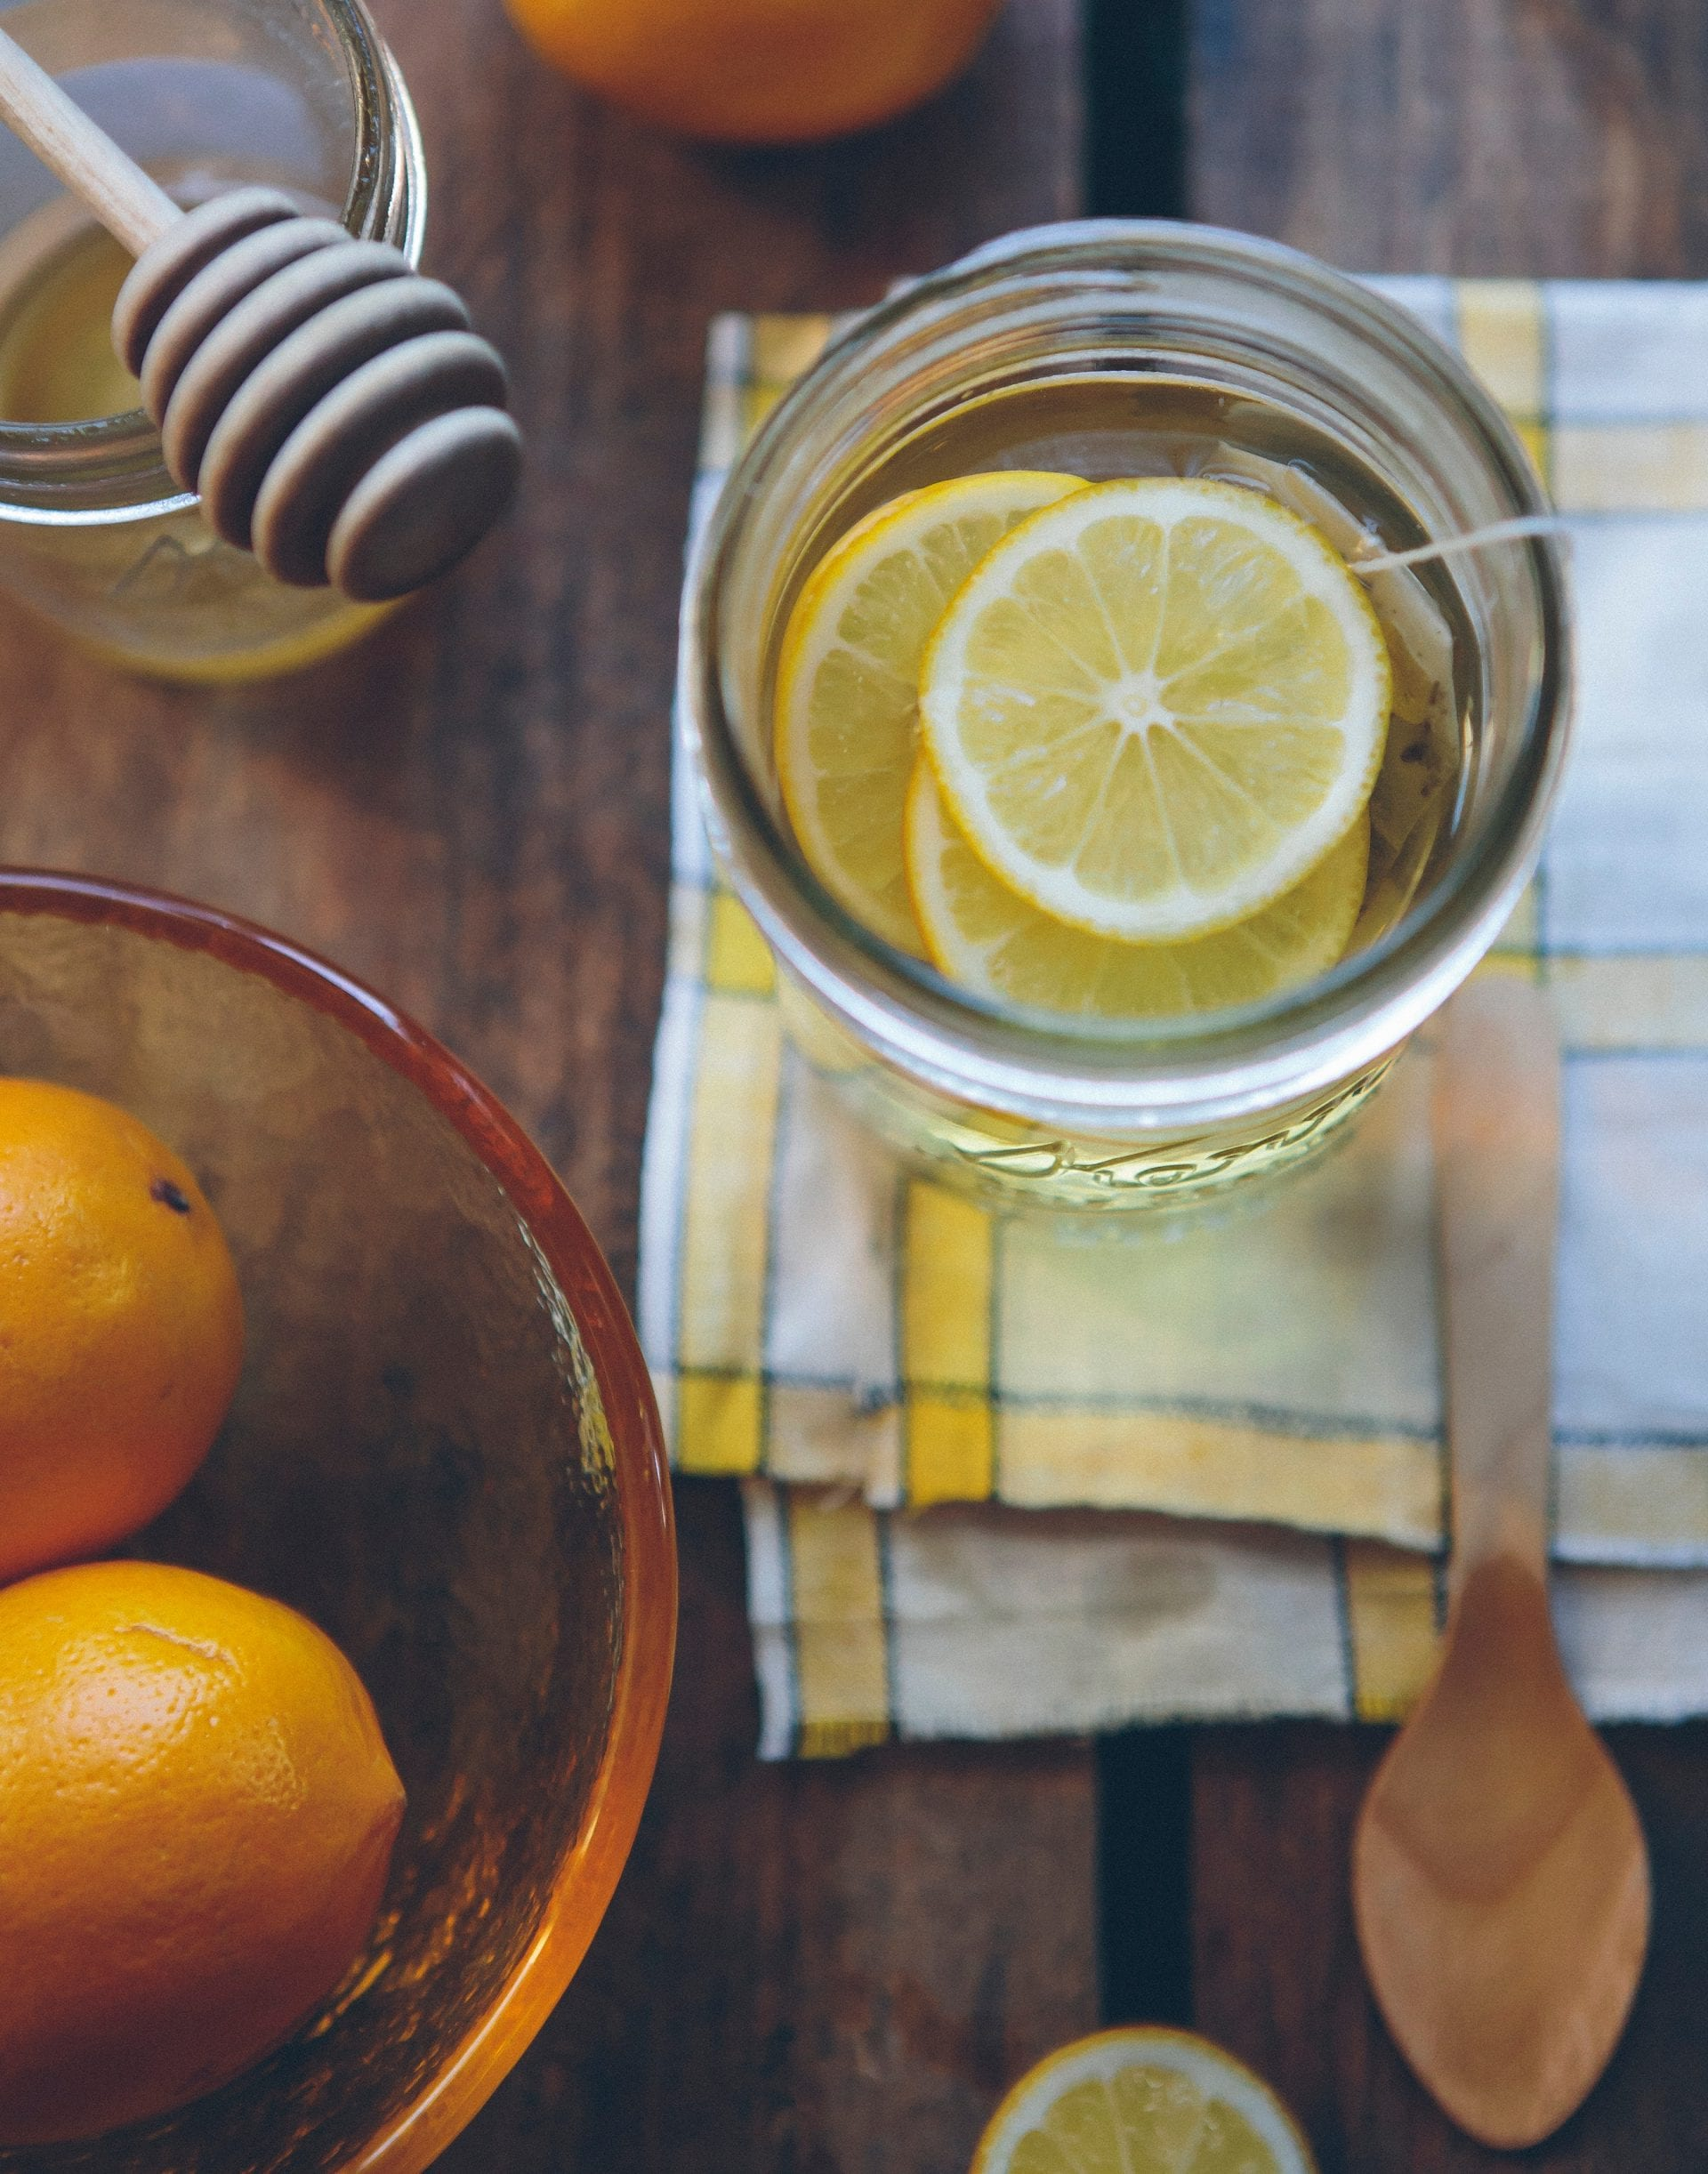 citron-med-pomarance-kuchynska-doska-lyzica